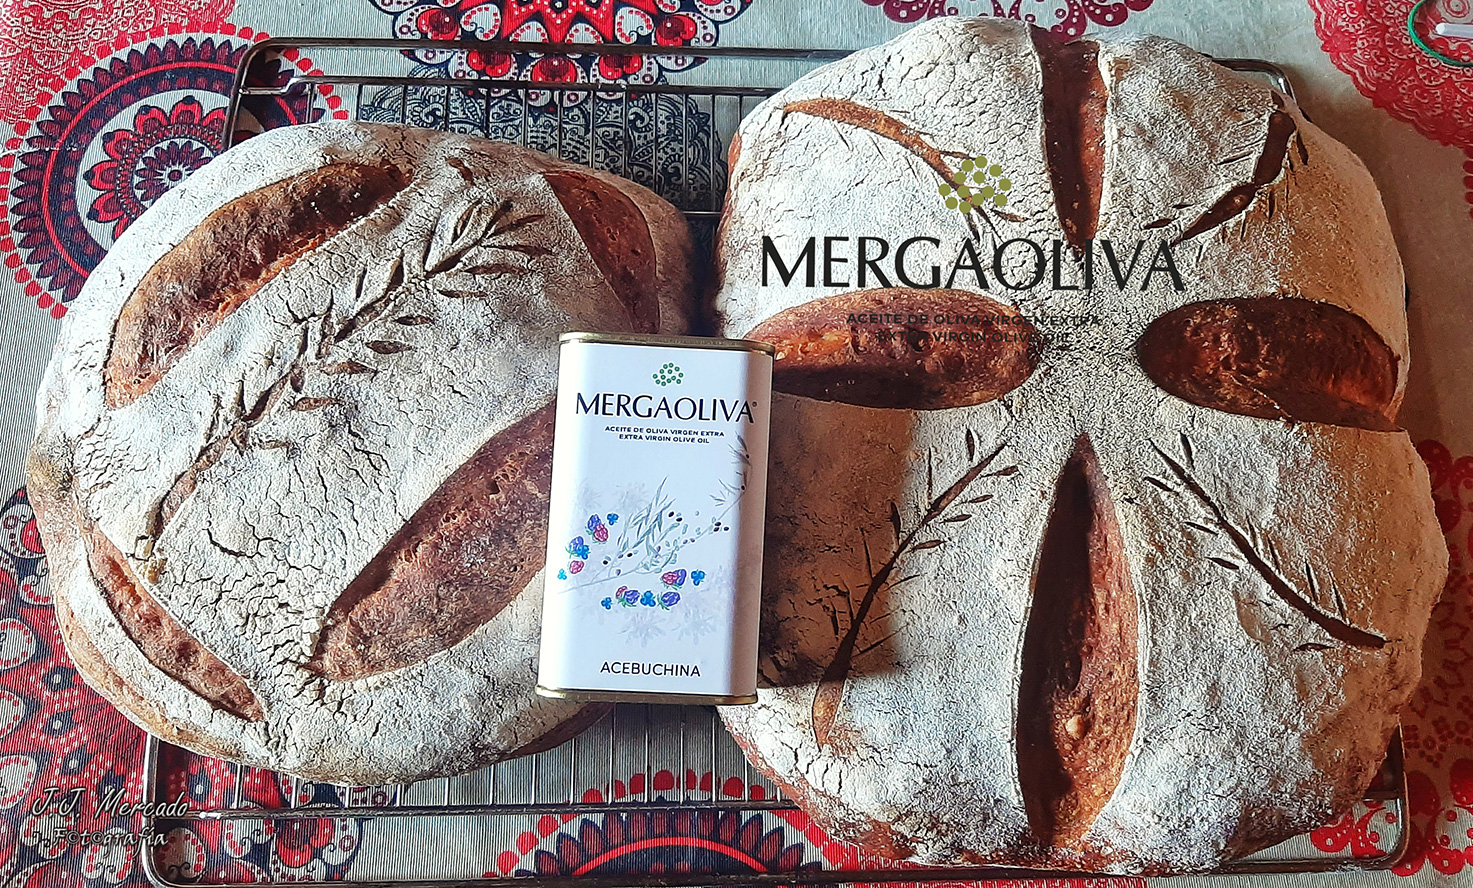 Pan con aceite de acebuchina mergaoliva